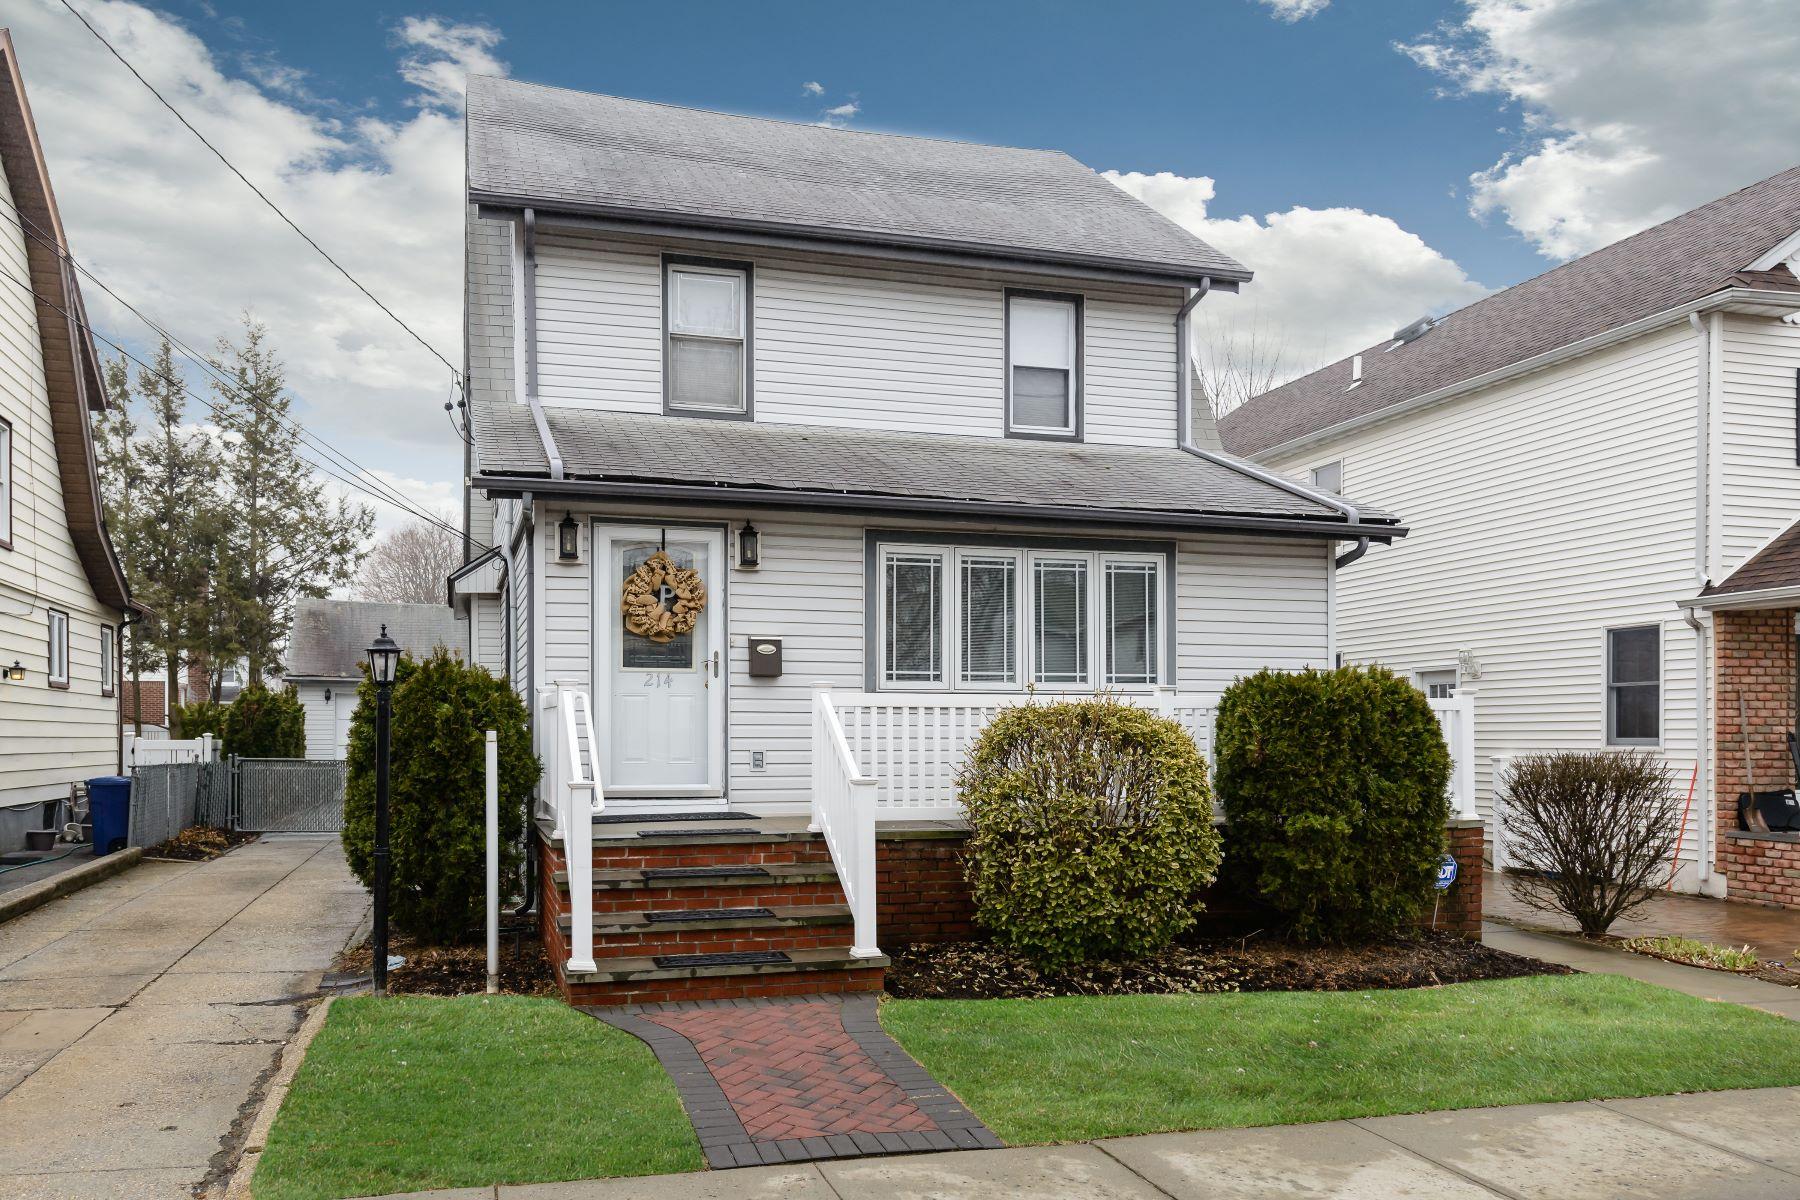 独户住宅 为 销售 在 214 Lowell Ave , Floral Park, NY 11001 214 Lowell Ave 花卉公园, 纽约州 11001 美国